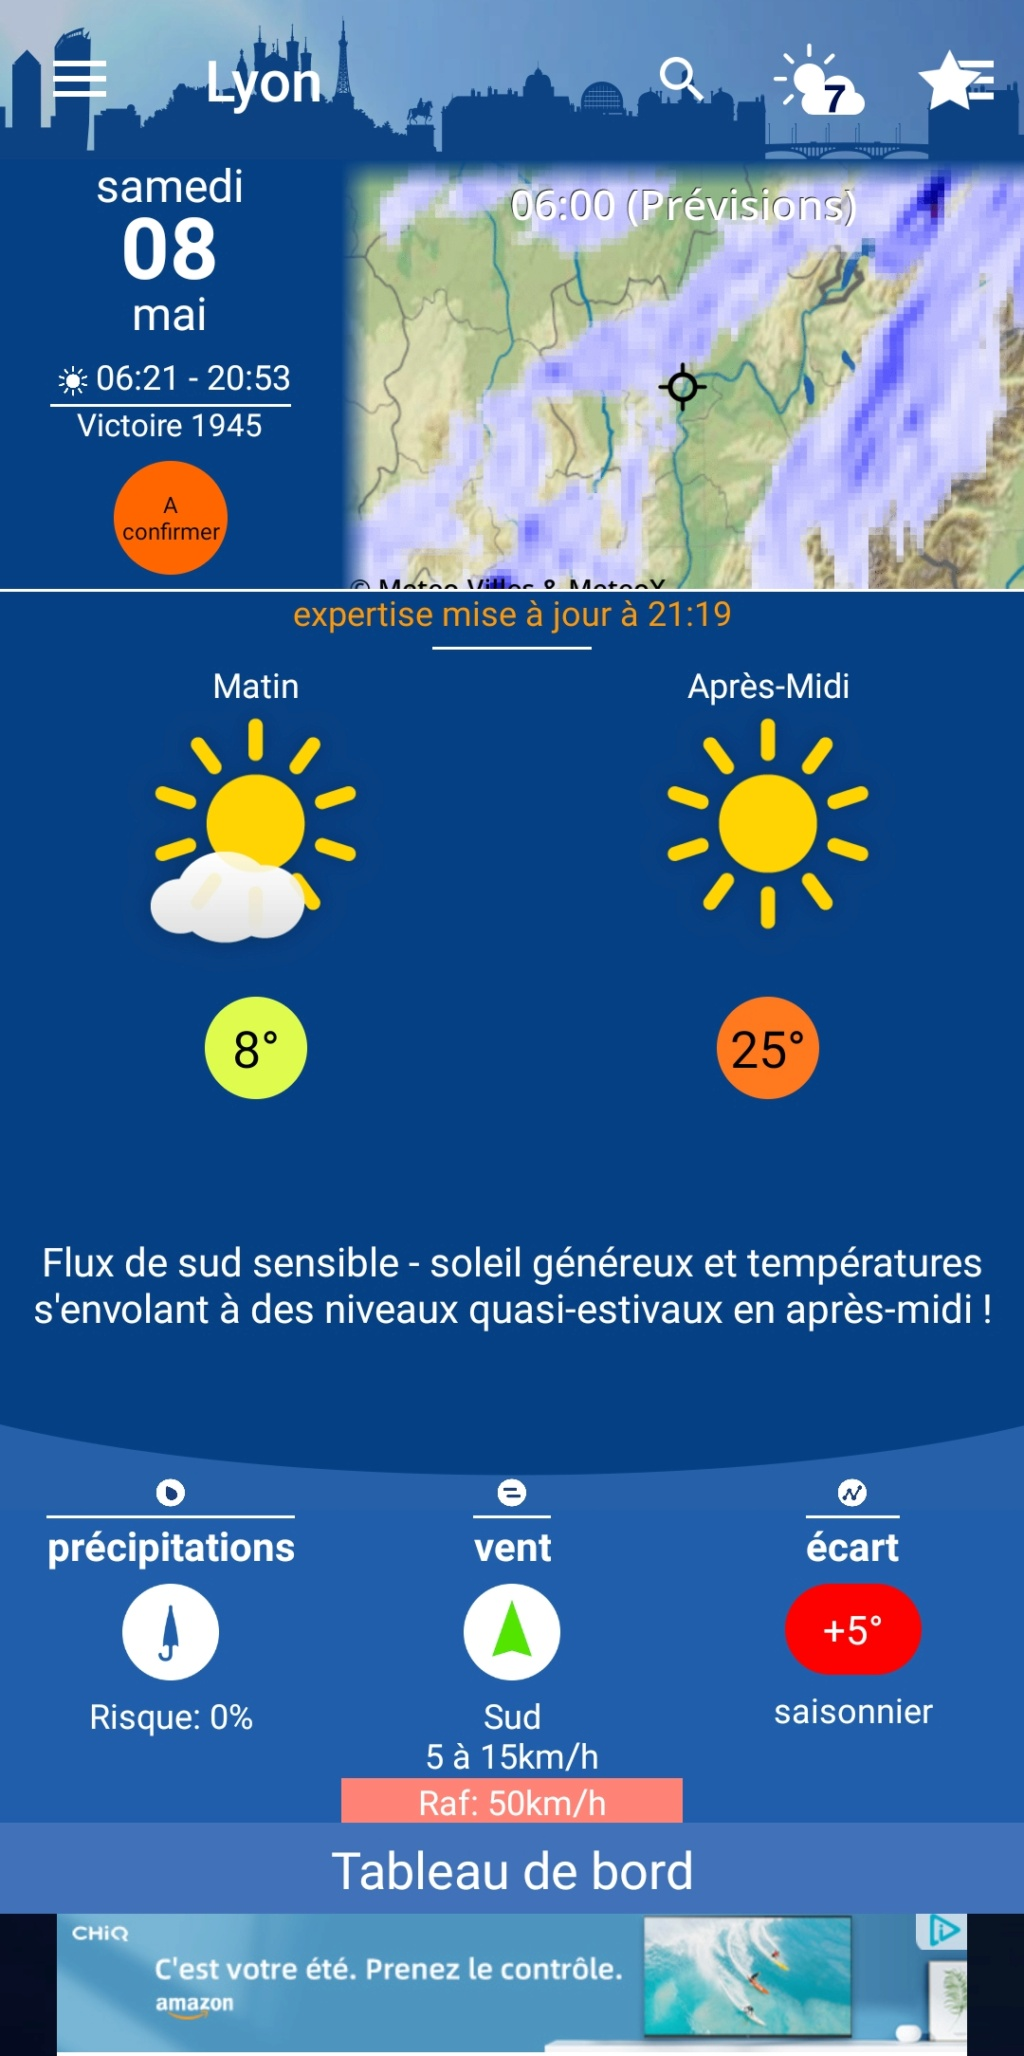 Visue 8 mai Rhône-Alpes - Page 2 Scree316